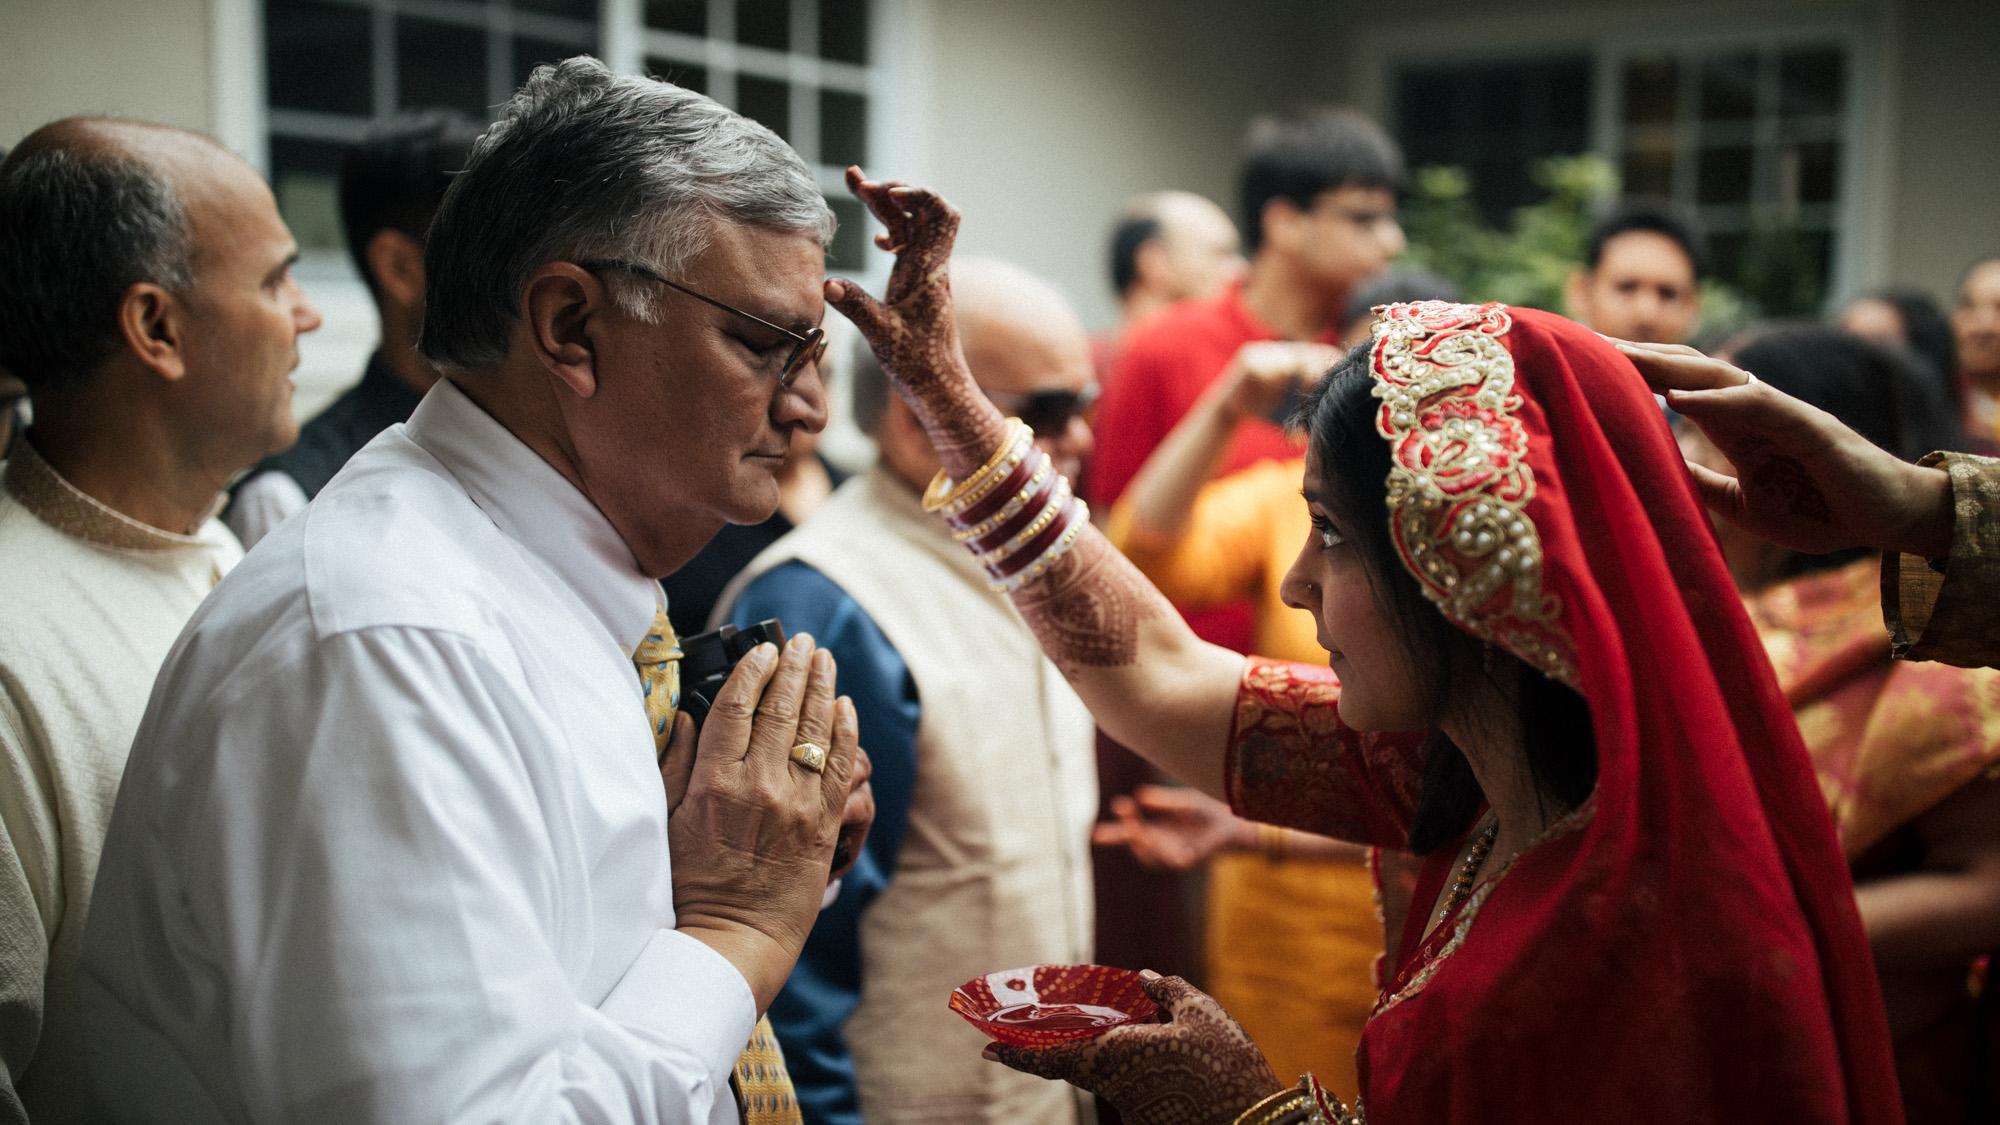 anu_maneesh_alec_vanderboom_Indian_wedding_photography-0197.jpg